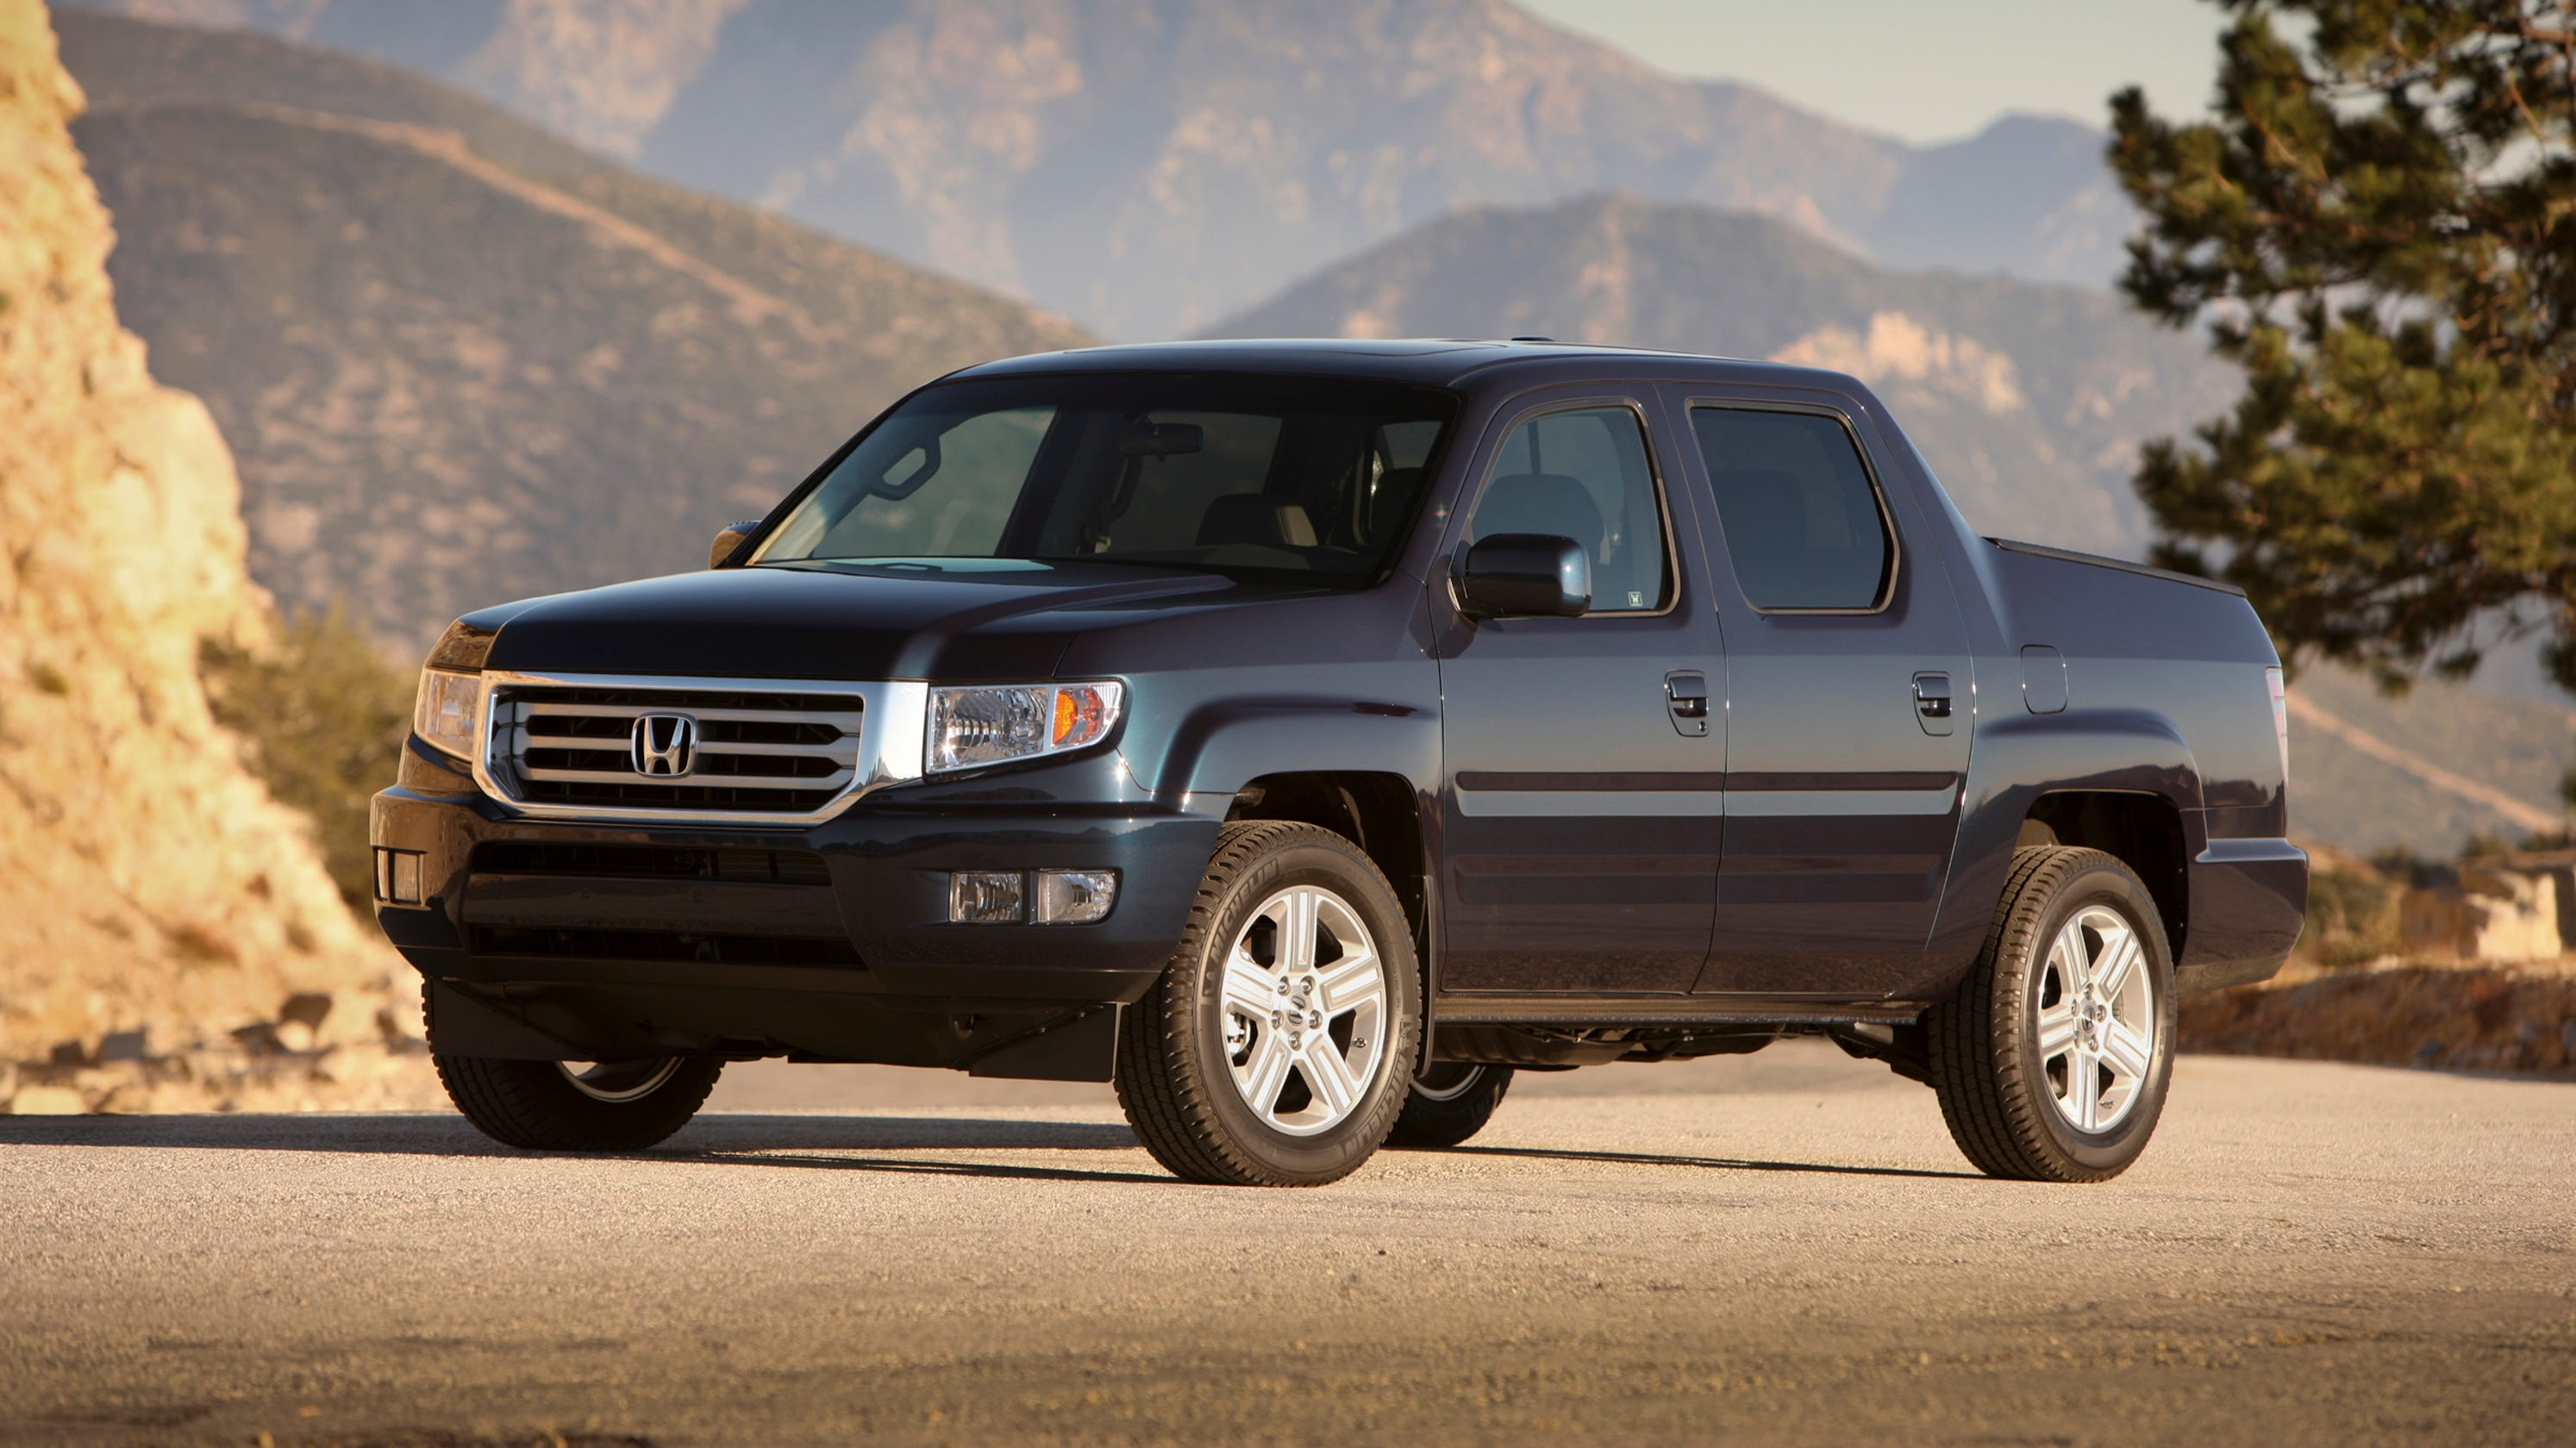 Recalls Honda Com >> Honda Recalls 1 4 Million Cars To Replace Air Bag Inflators